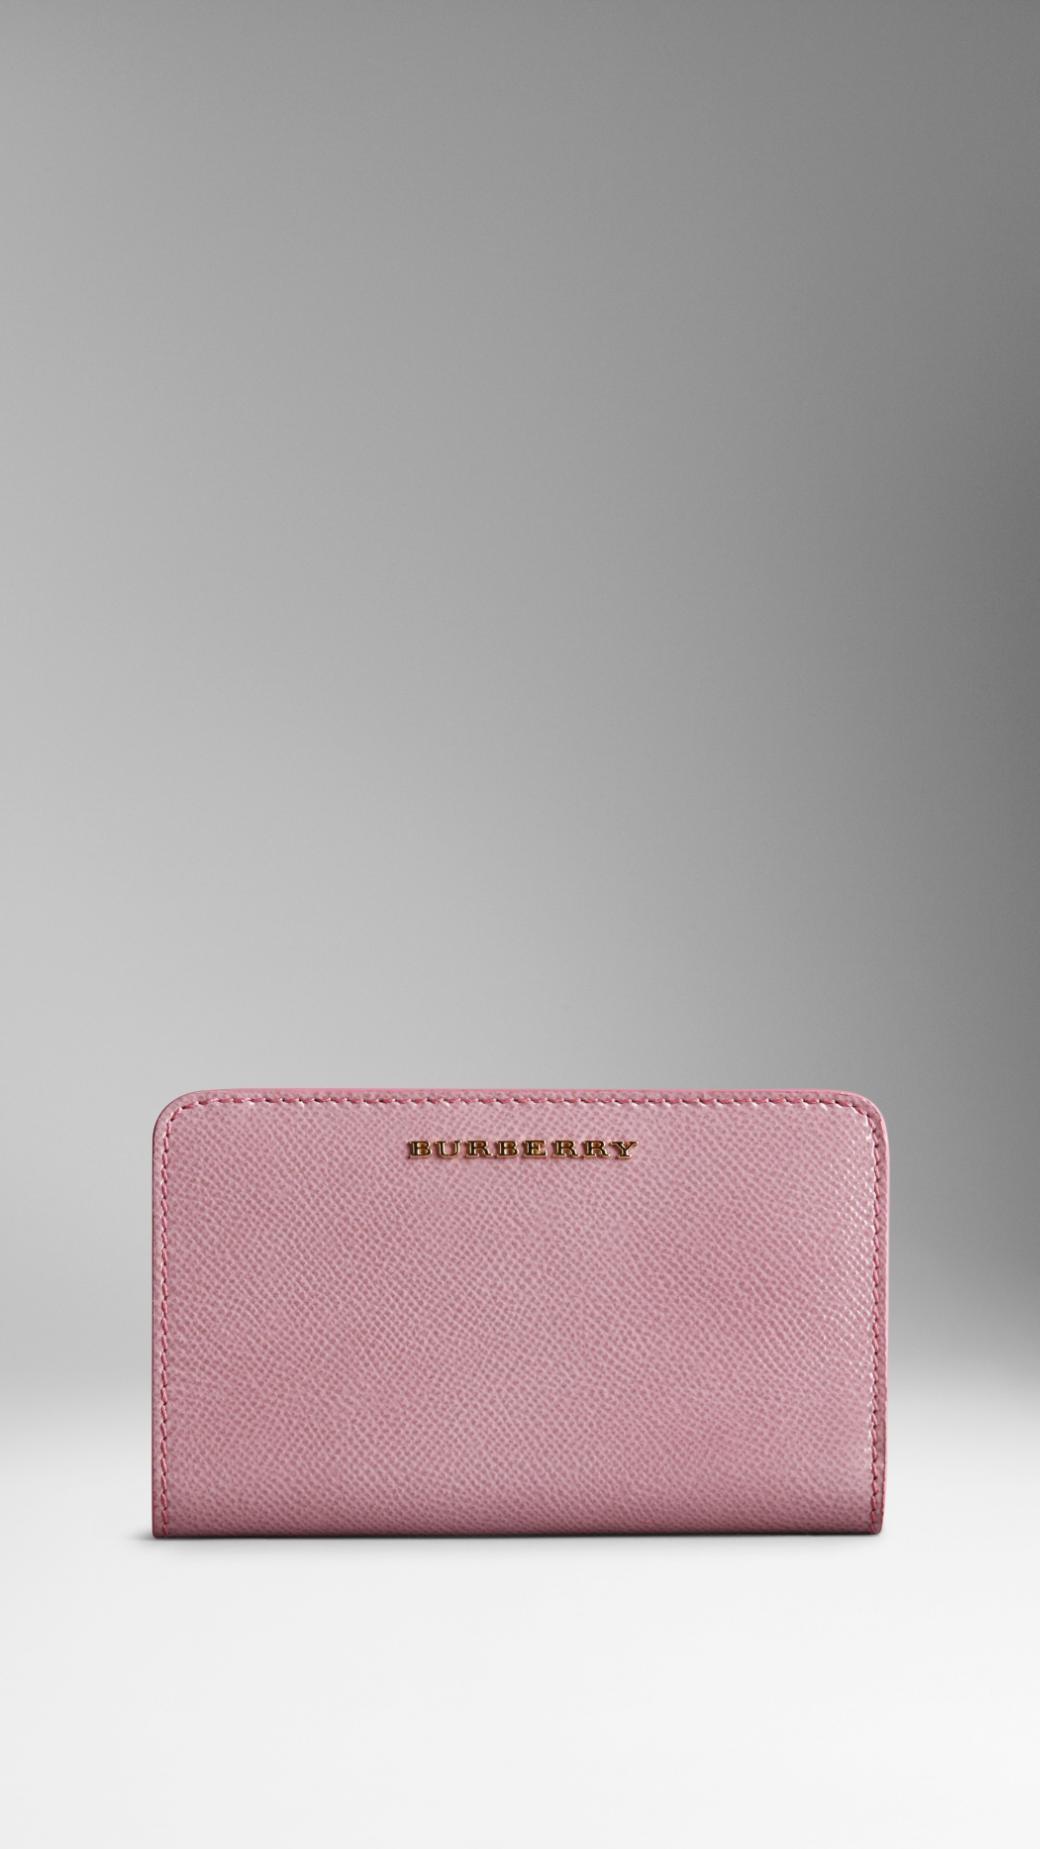 608b43177281 Pink Burberry Purse - Best Purse Image Ccdbb.Org